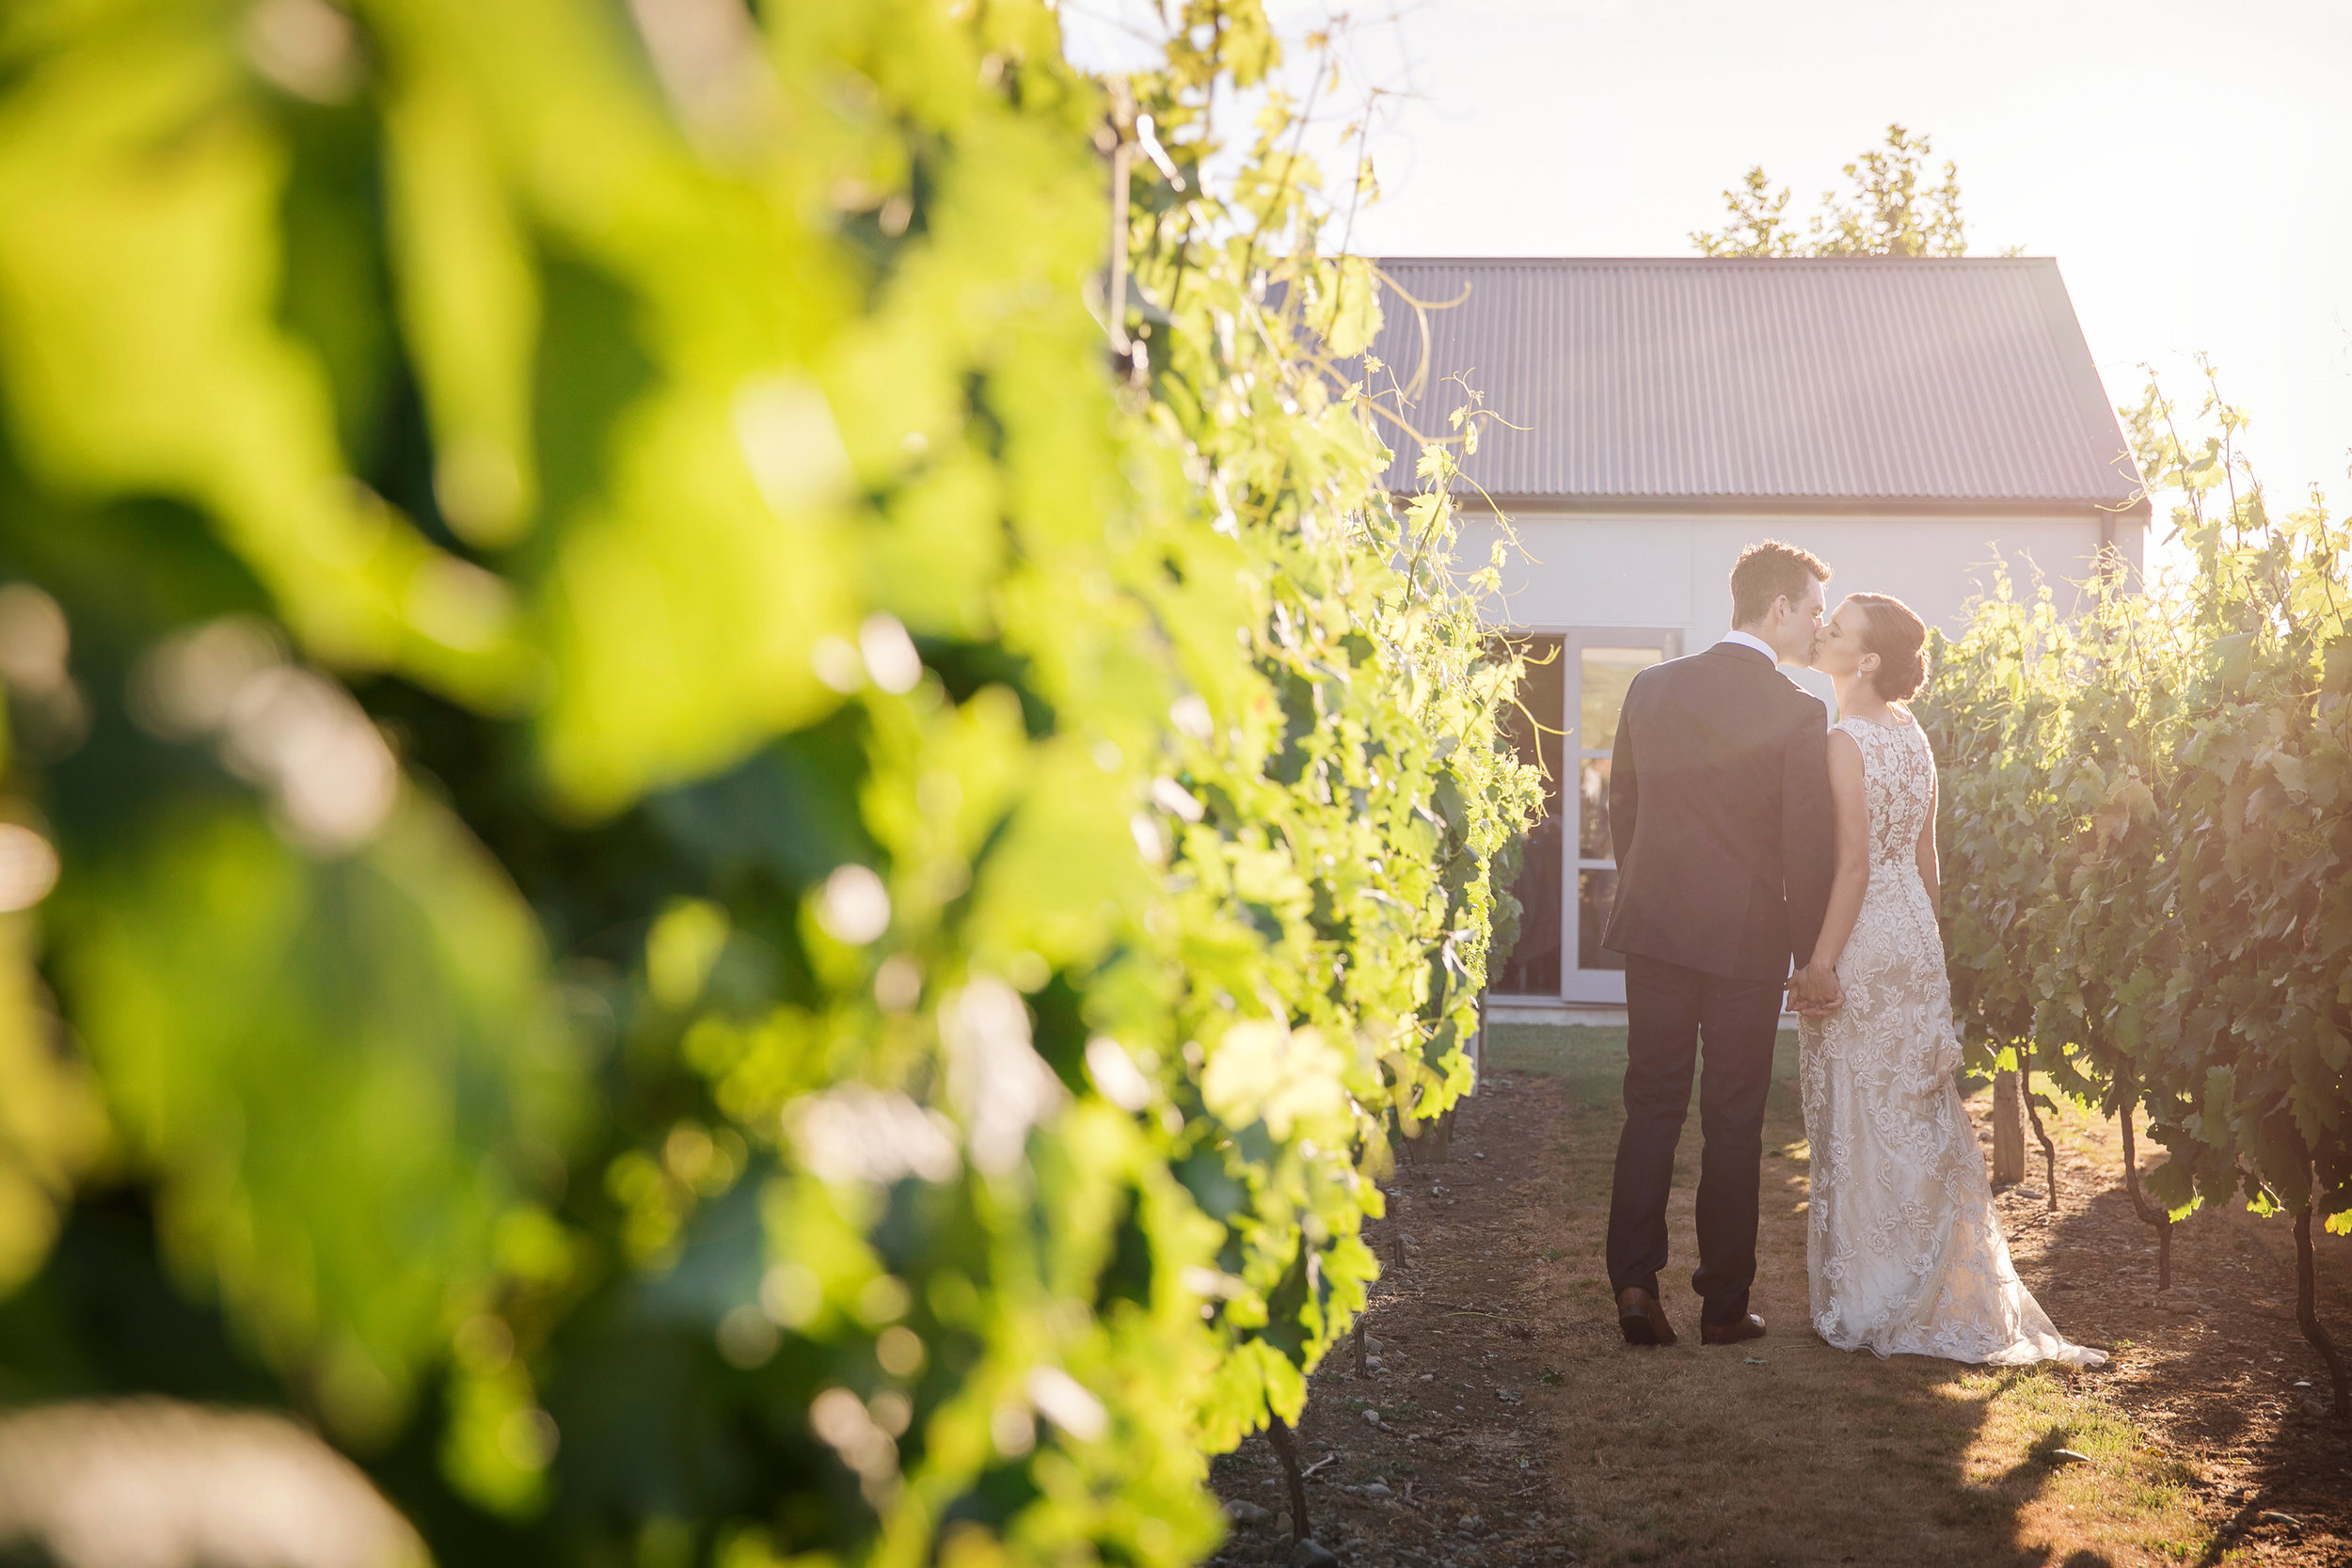 Martinborough-Poppies-Wedding-Caine-Eloise-Toni-Larsen-0116.jpg